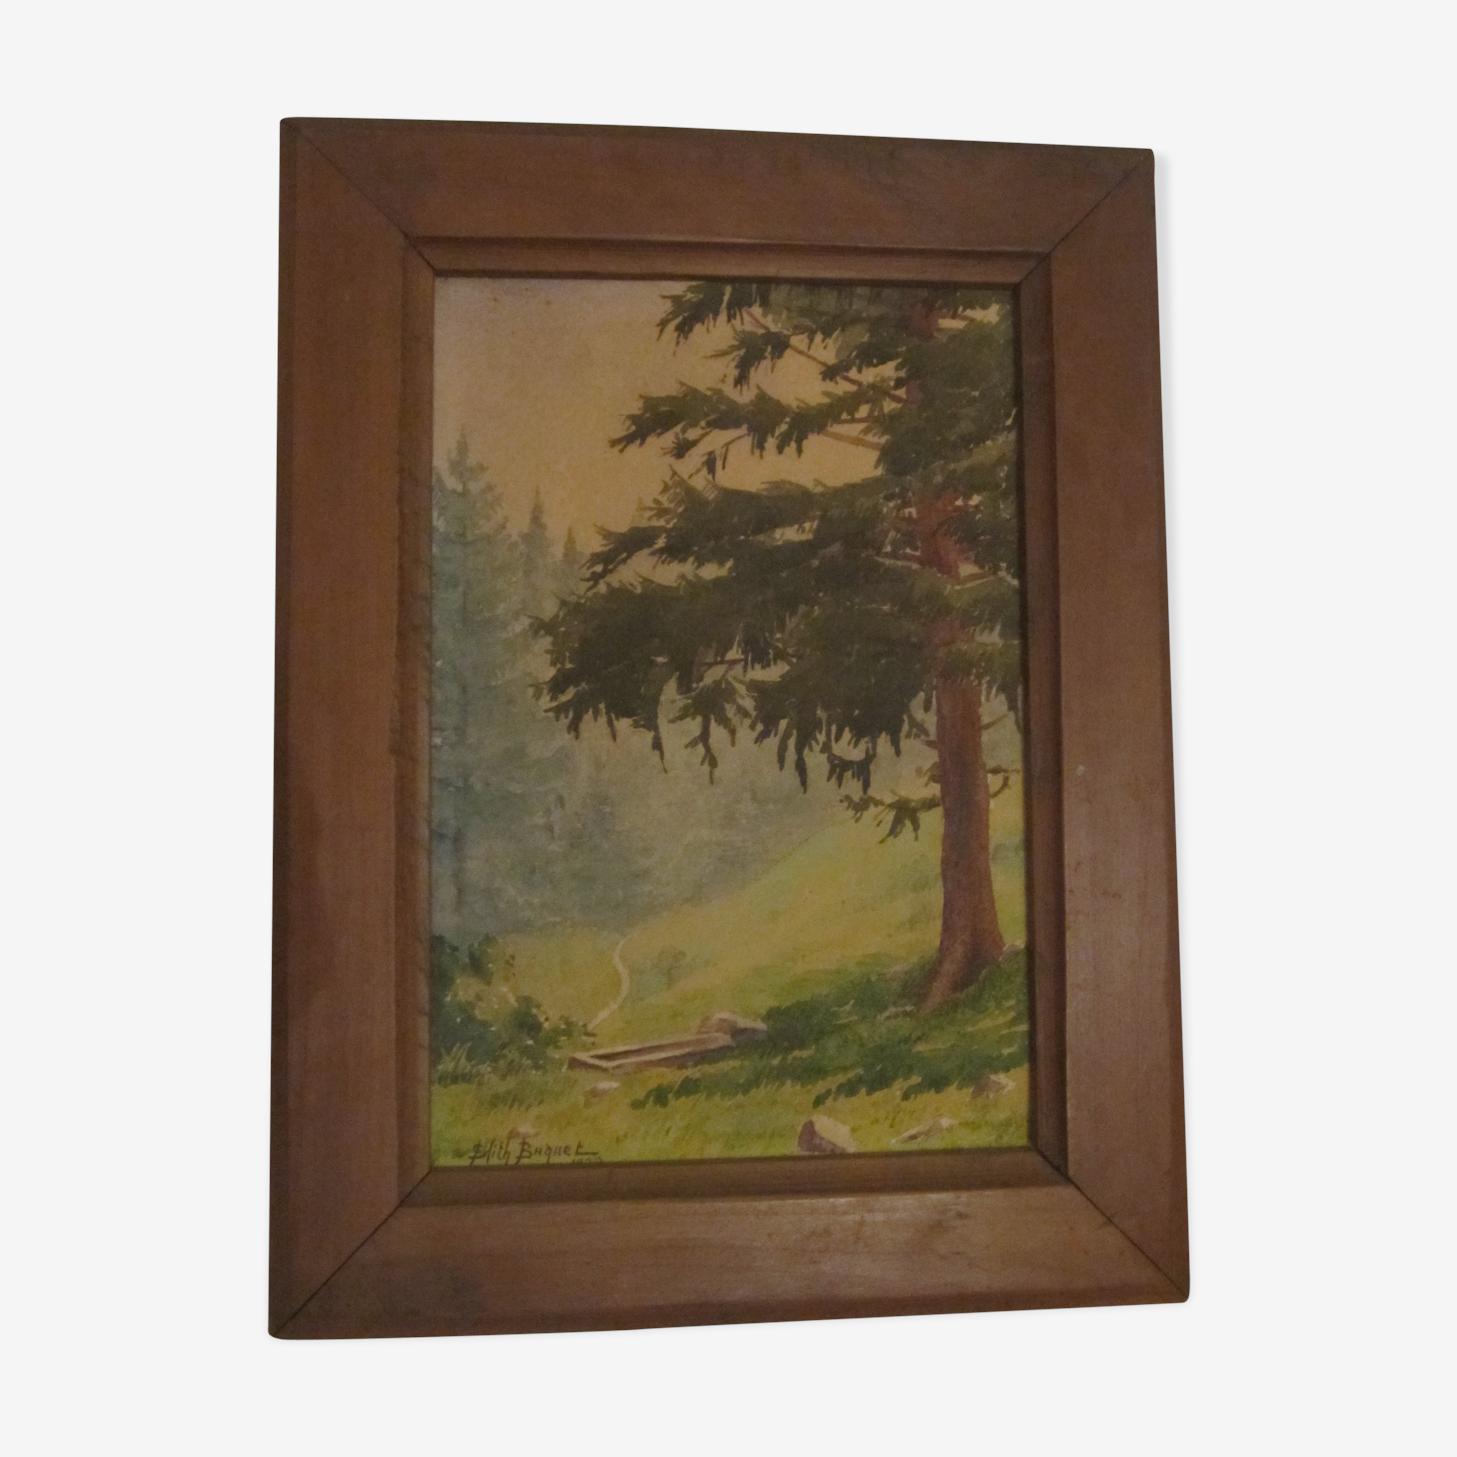 Edith Brady 1928 painting